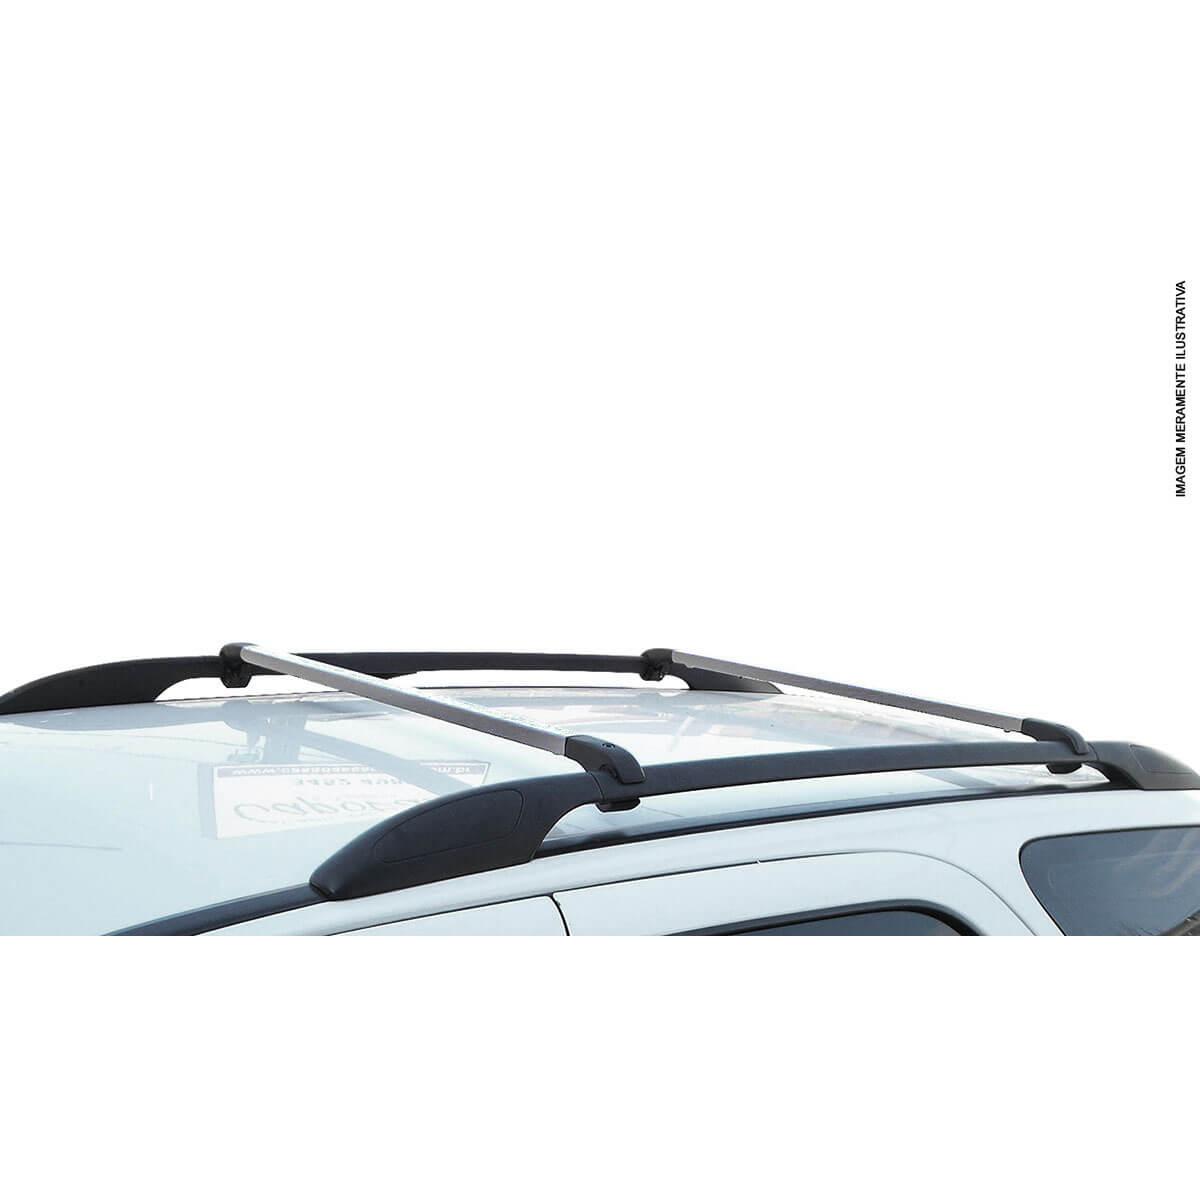 Travessa rack de teto alumínio UP! Cross VW up 2014 a 2018